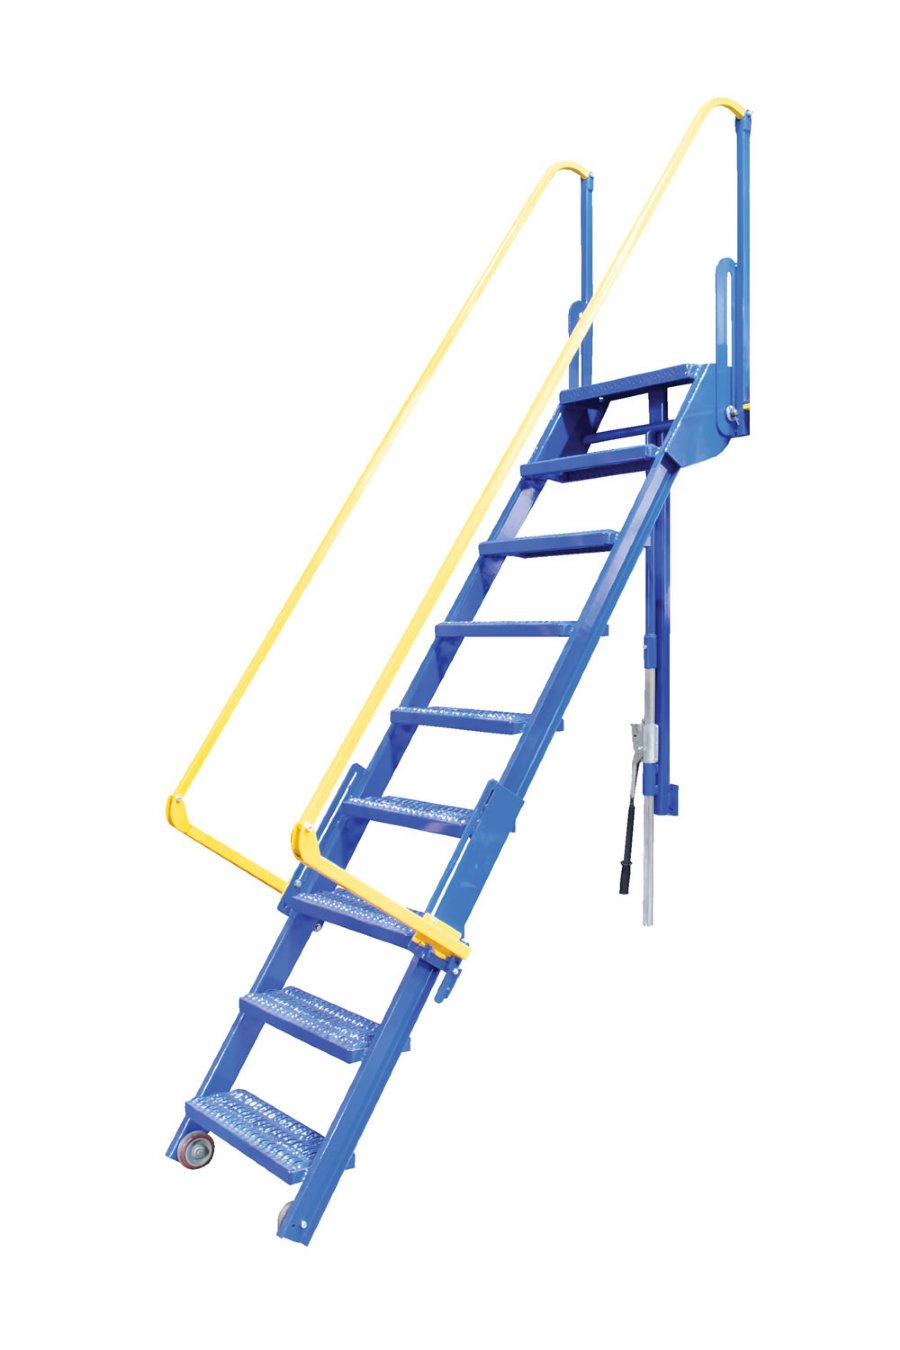 9 Step Folding Mezzanine Ladders